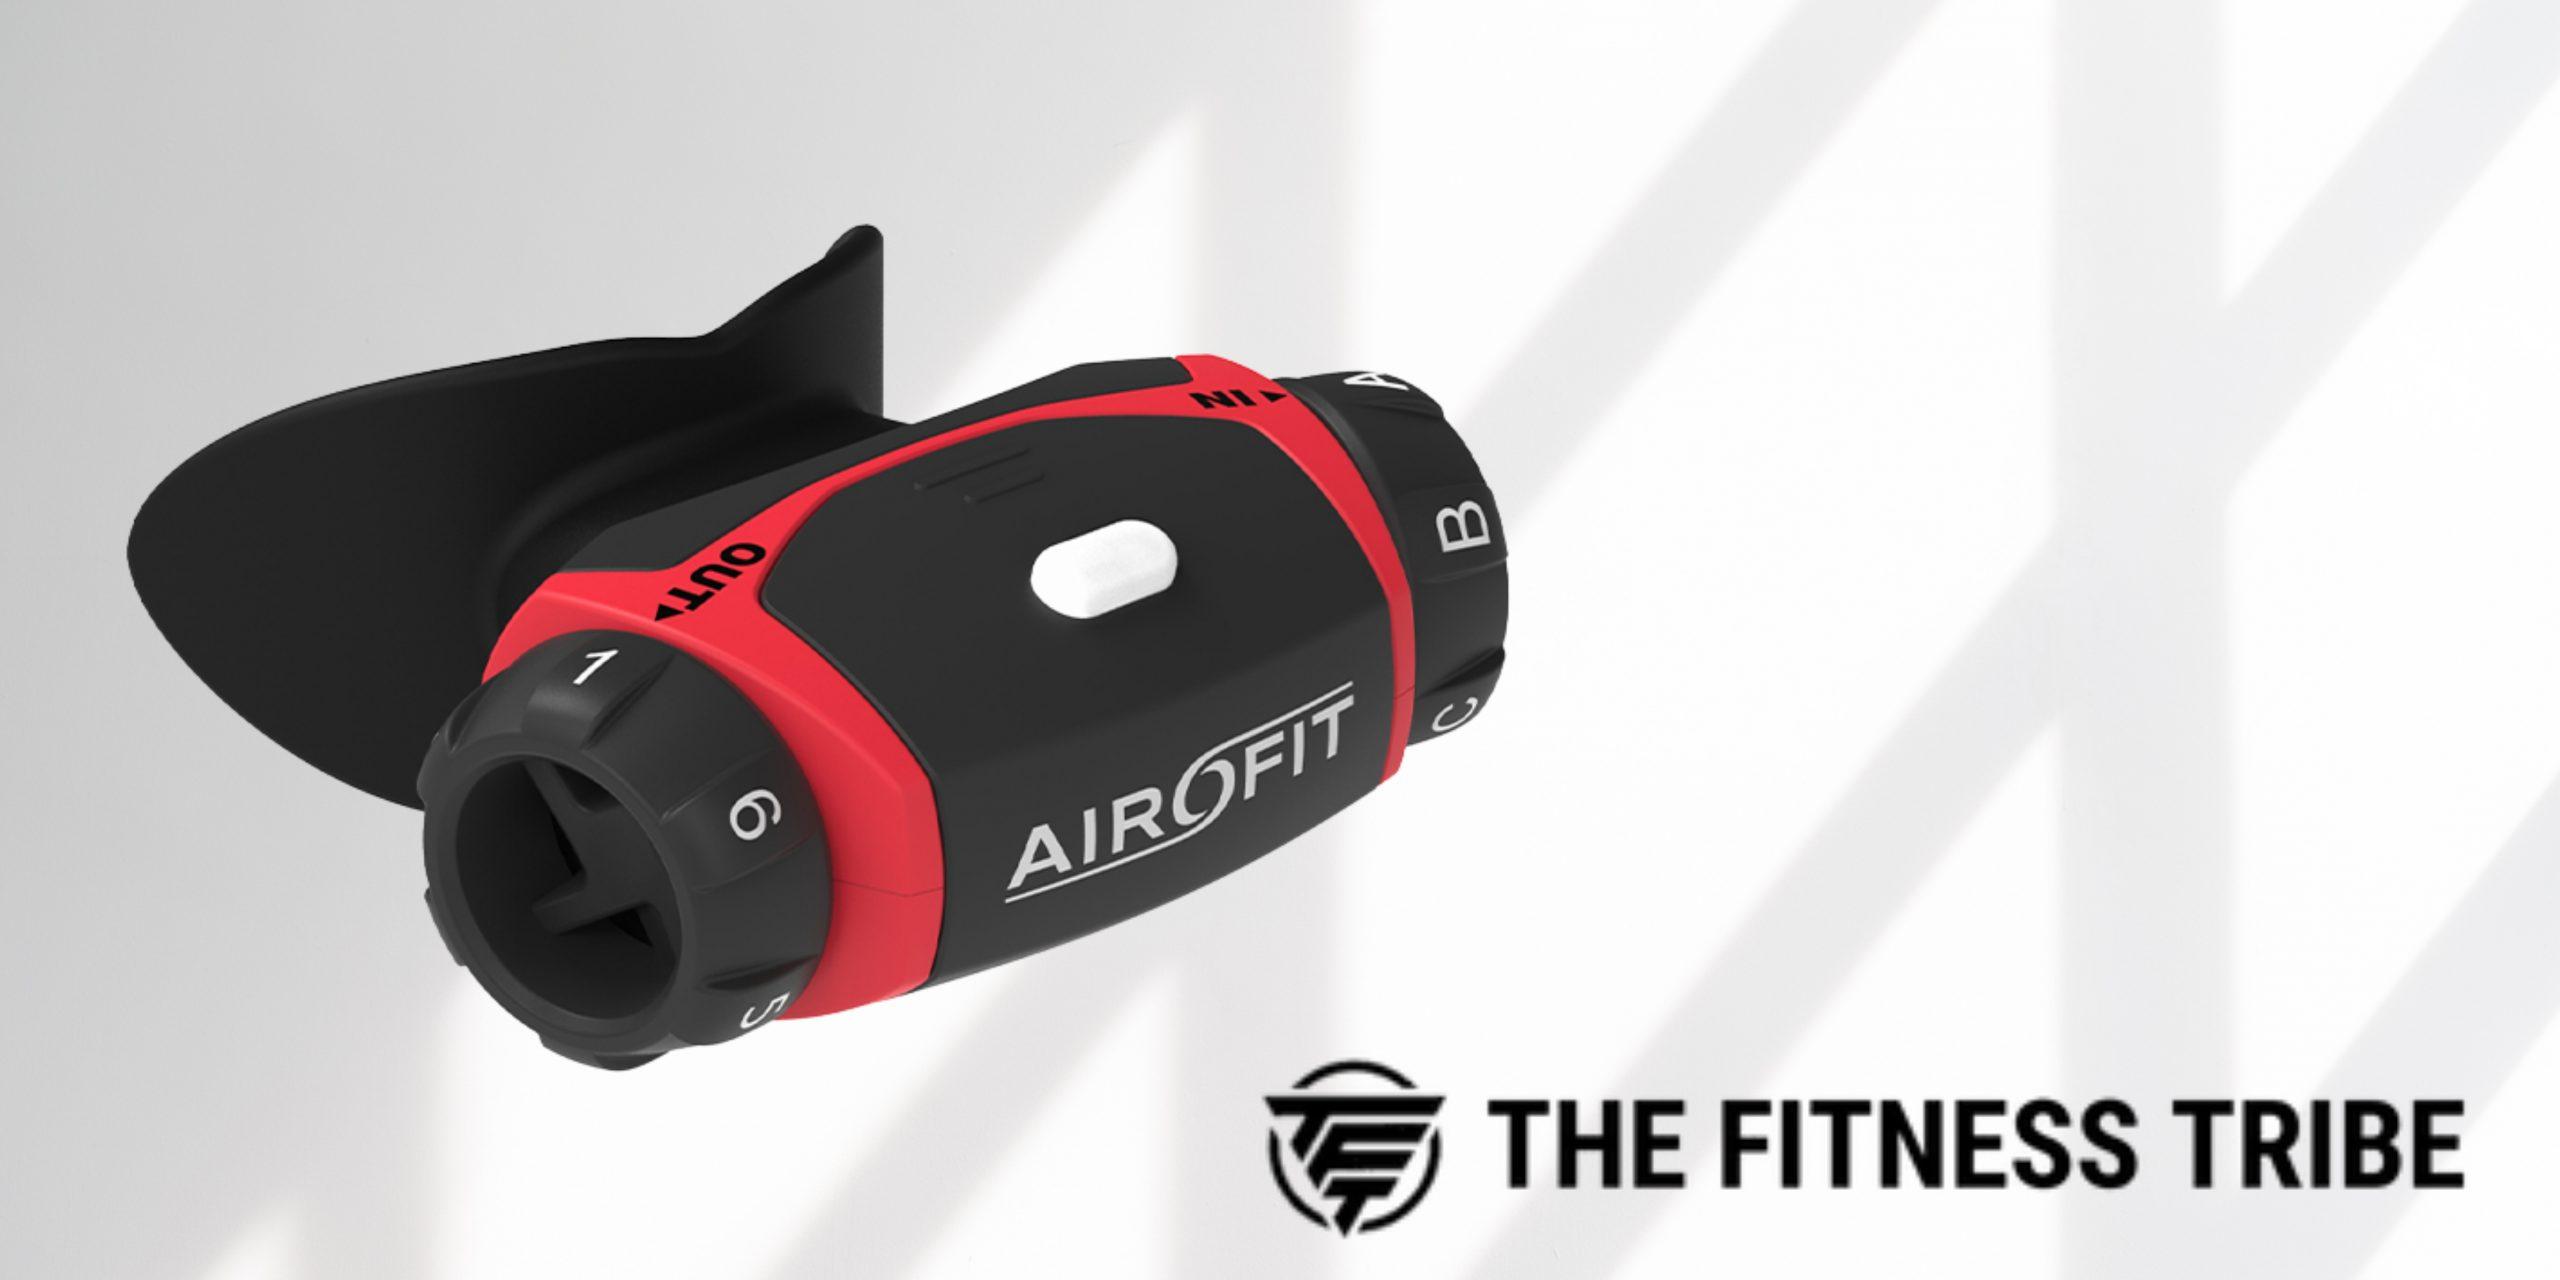 Airofit PRO|Stay a Breath Ahead